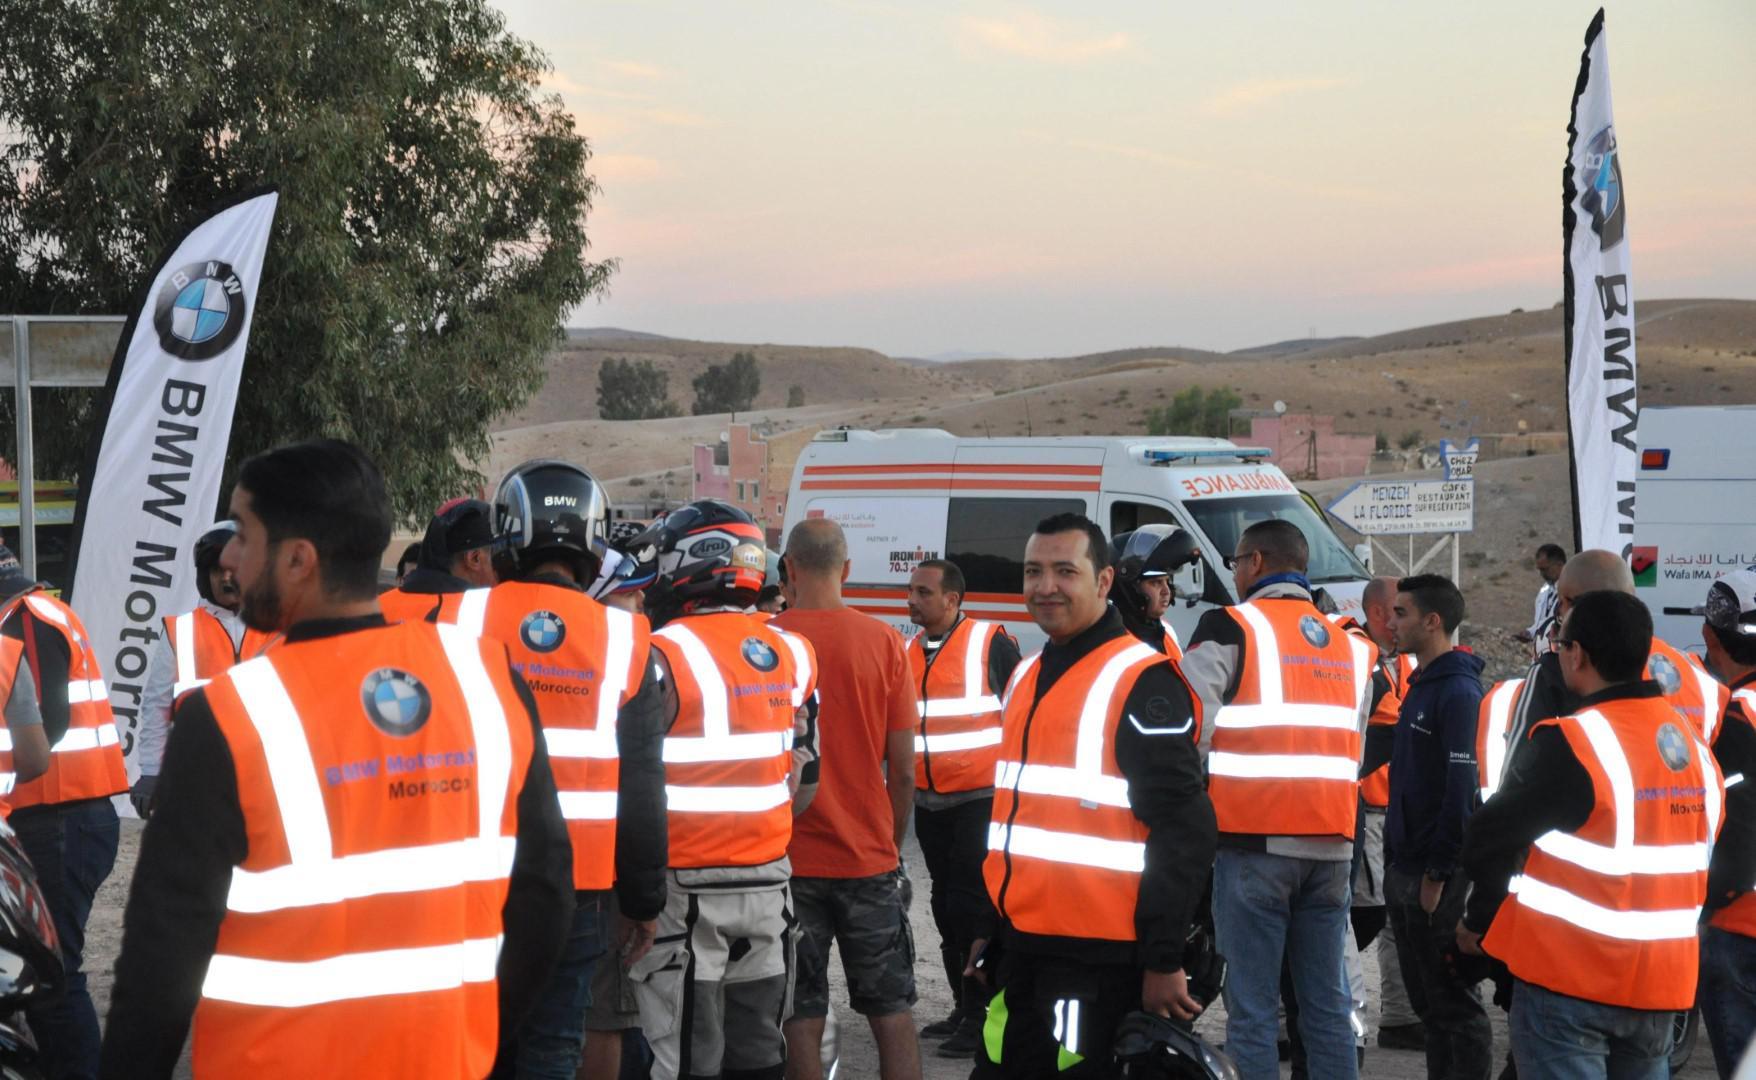 bwm-motorrad-morocco-iron-man-morocco-1143-3.jpg